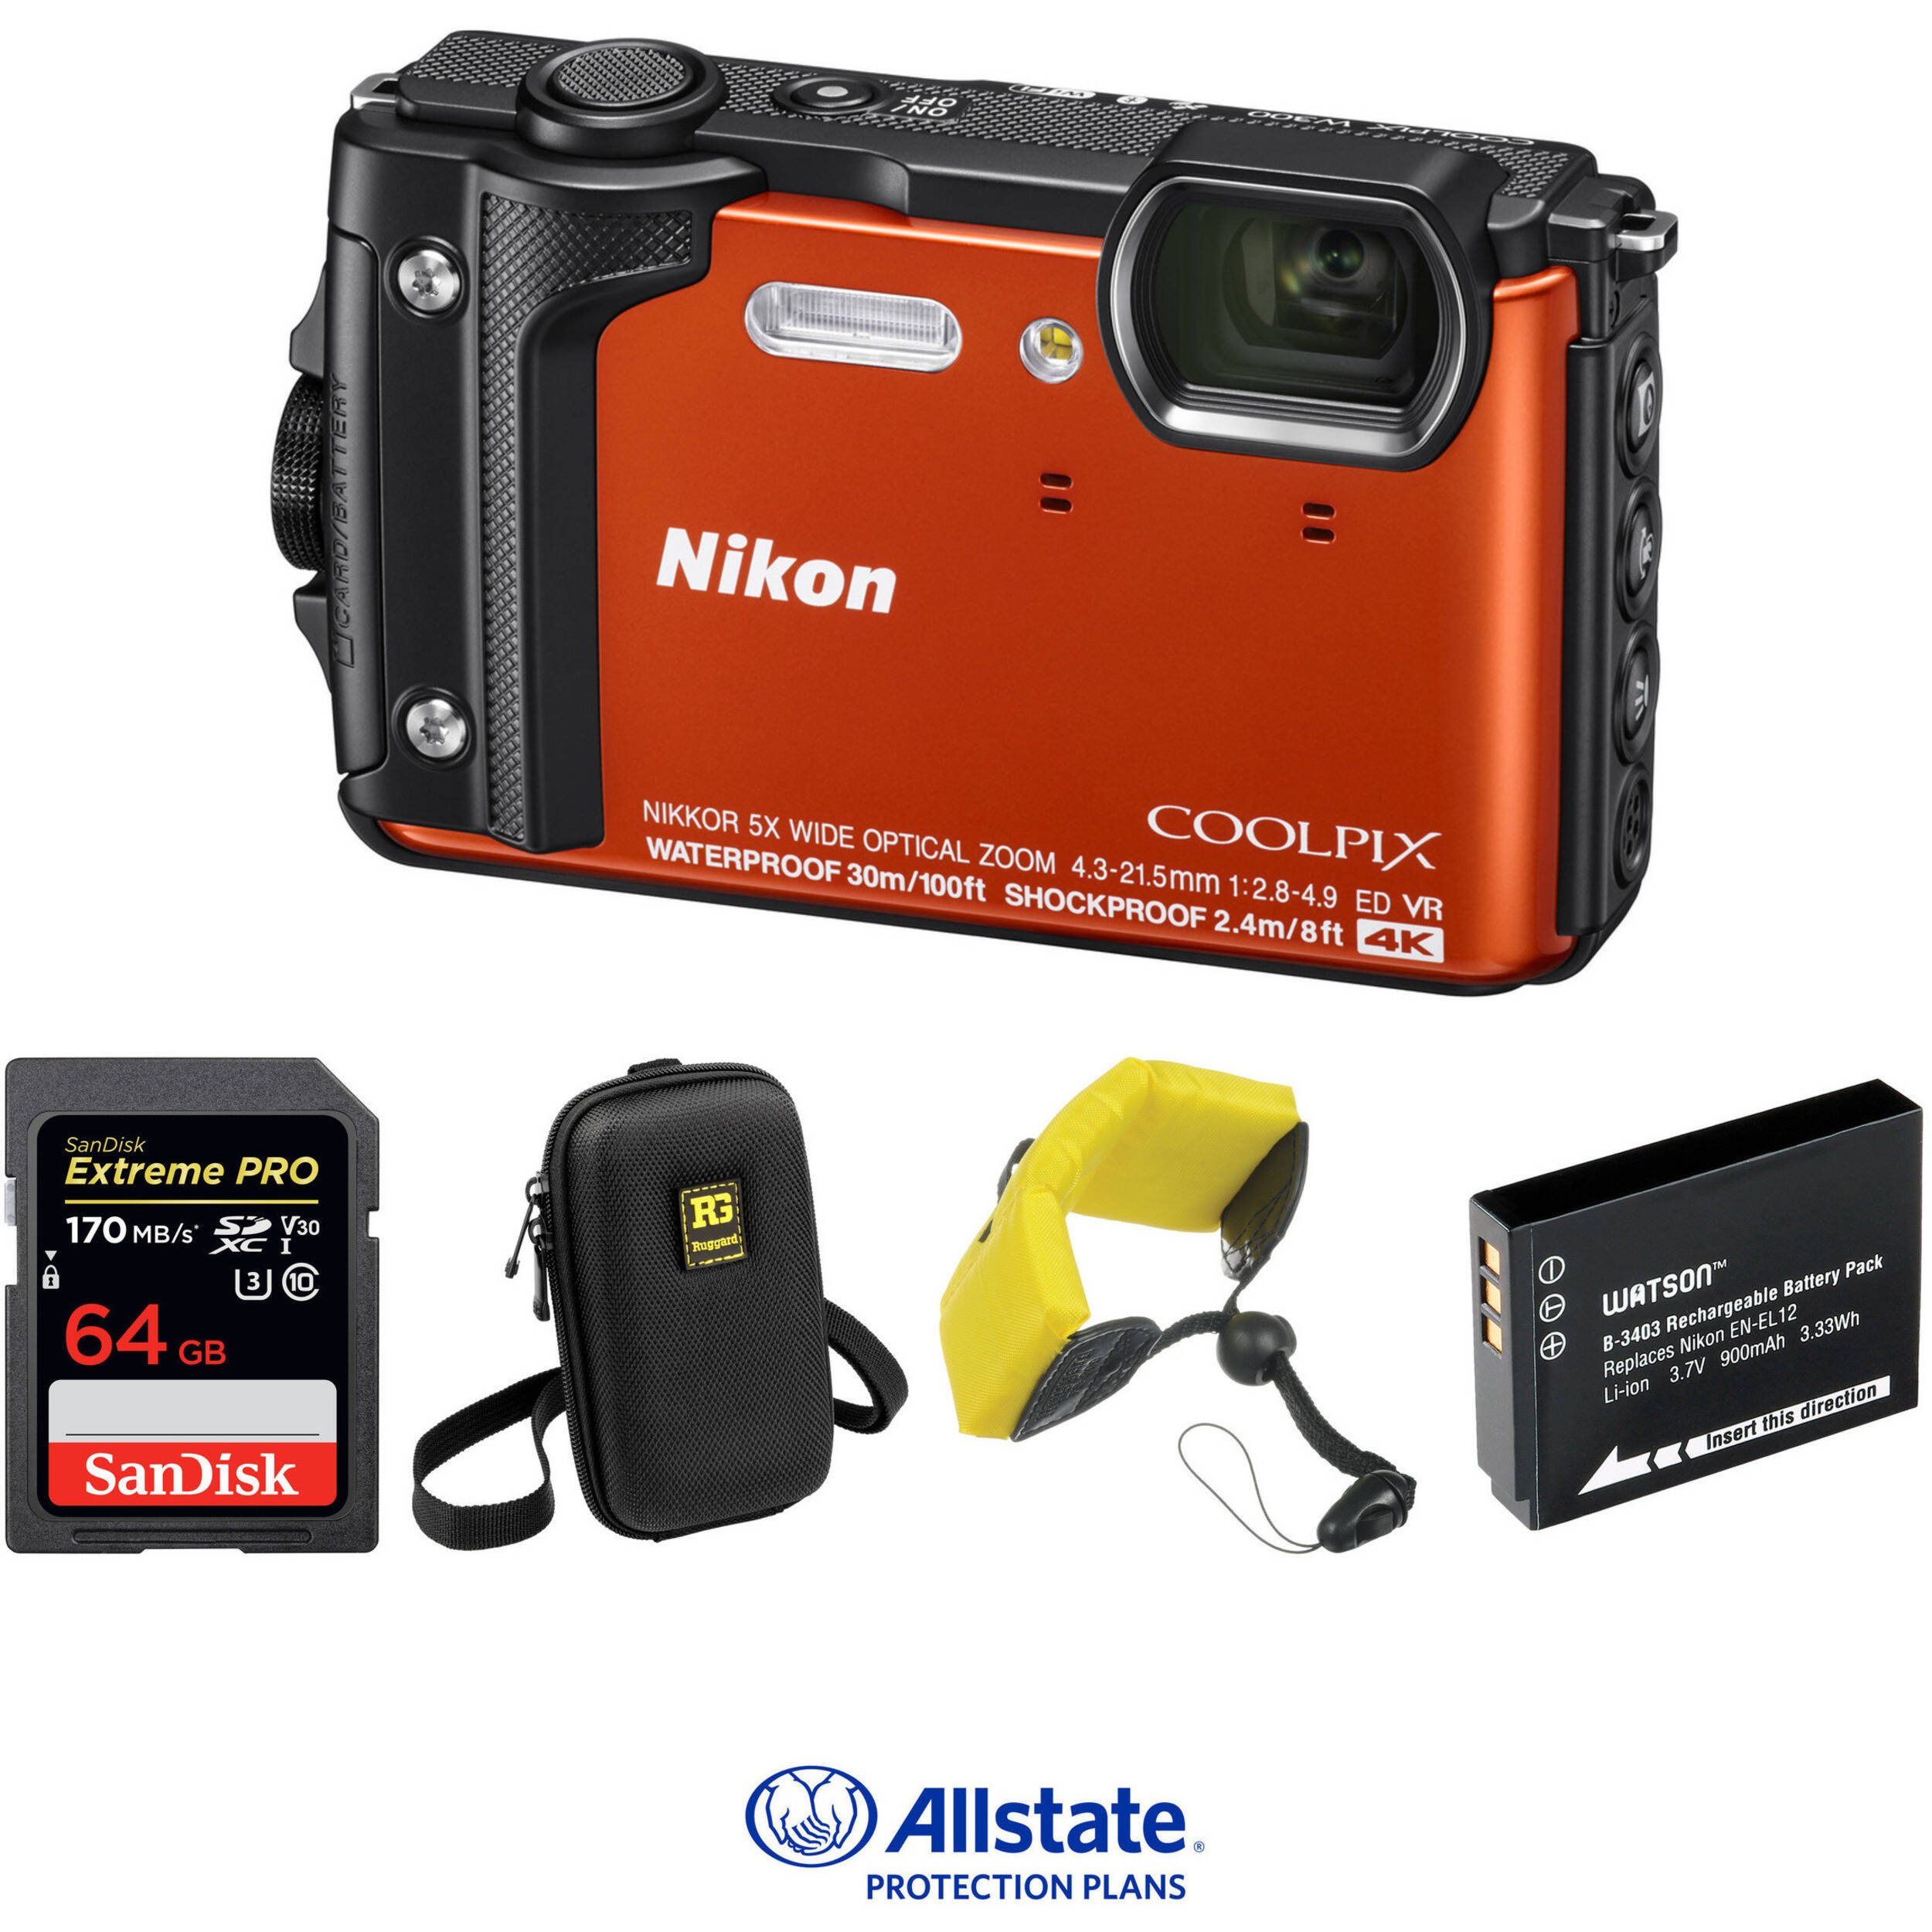 Nikon COOLPIX W300 Digital Camera Deluxe Kit (Orange) B&H Photo